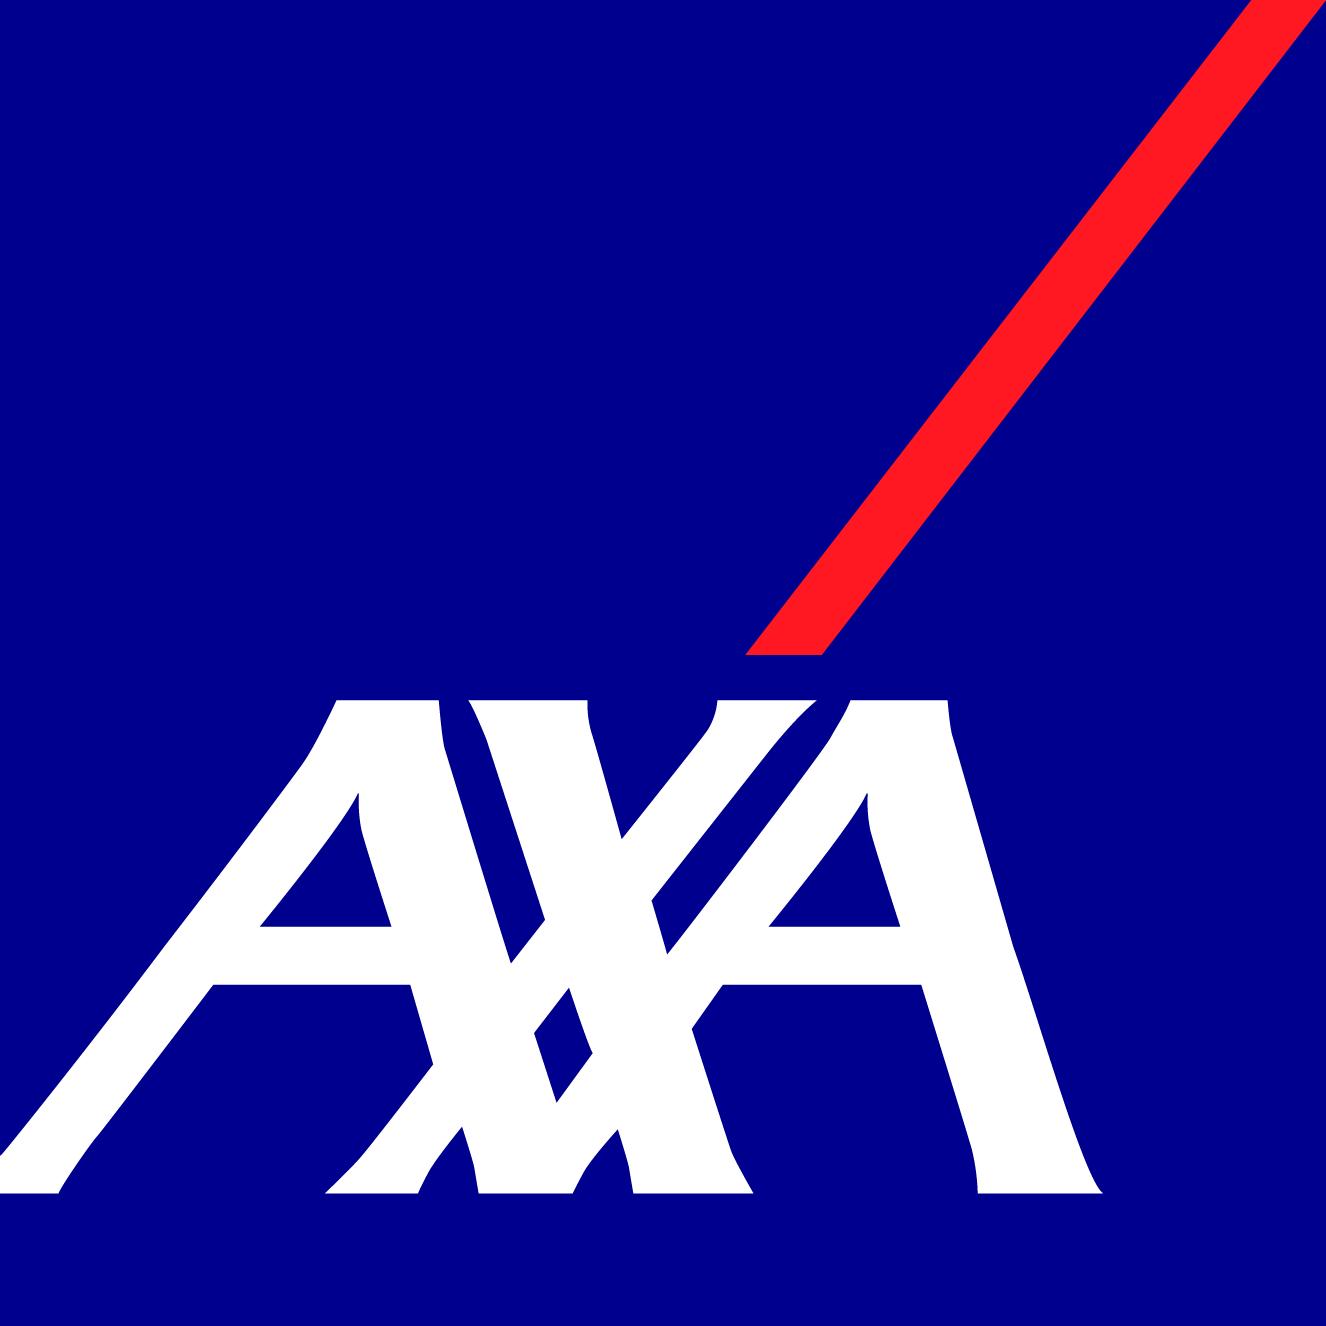 AXA Logo png